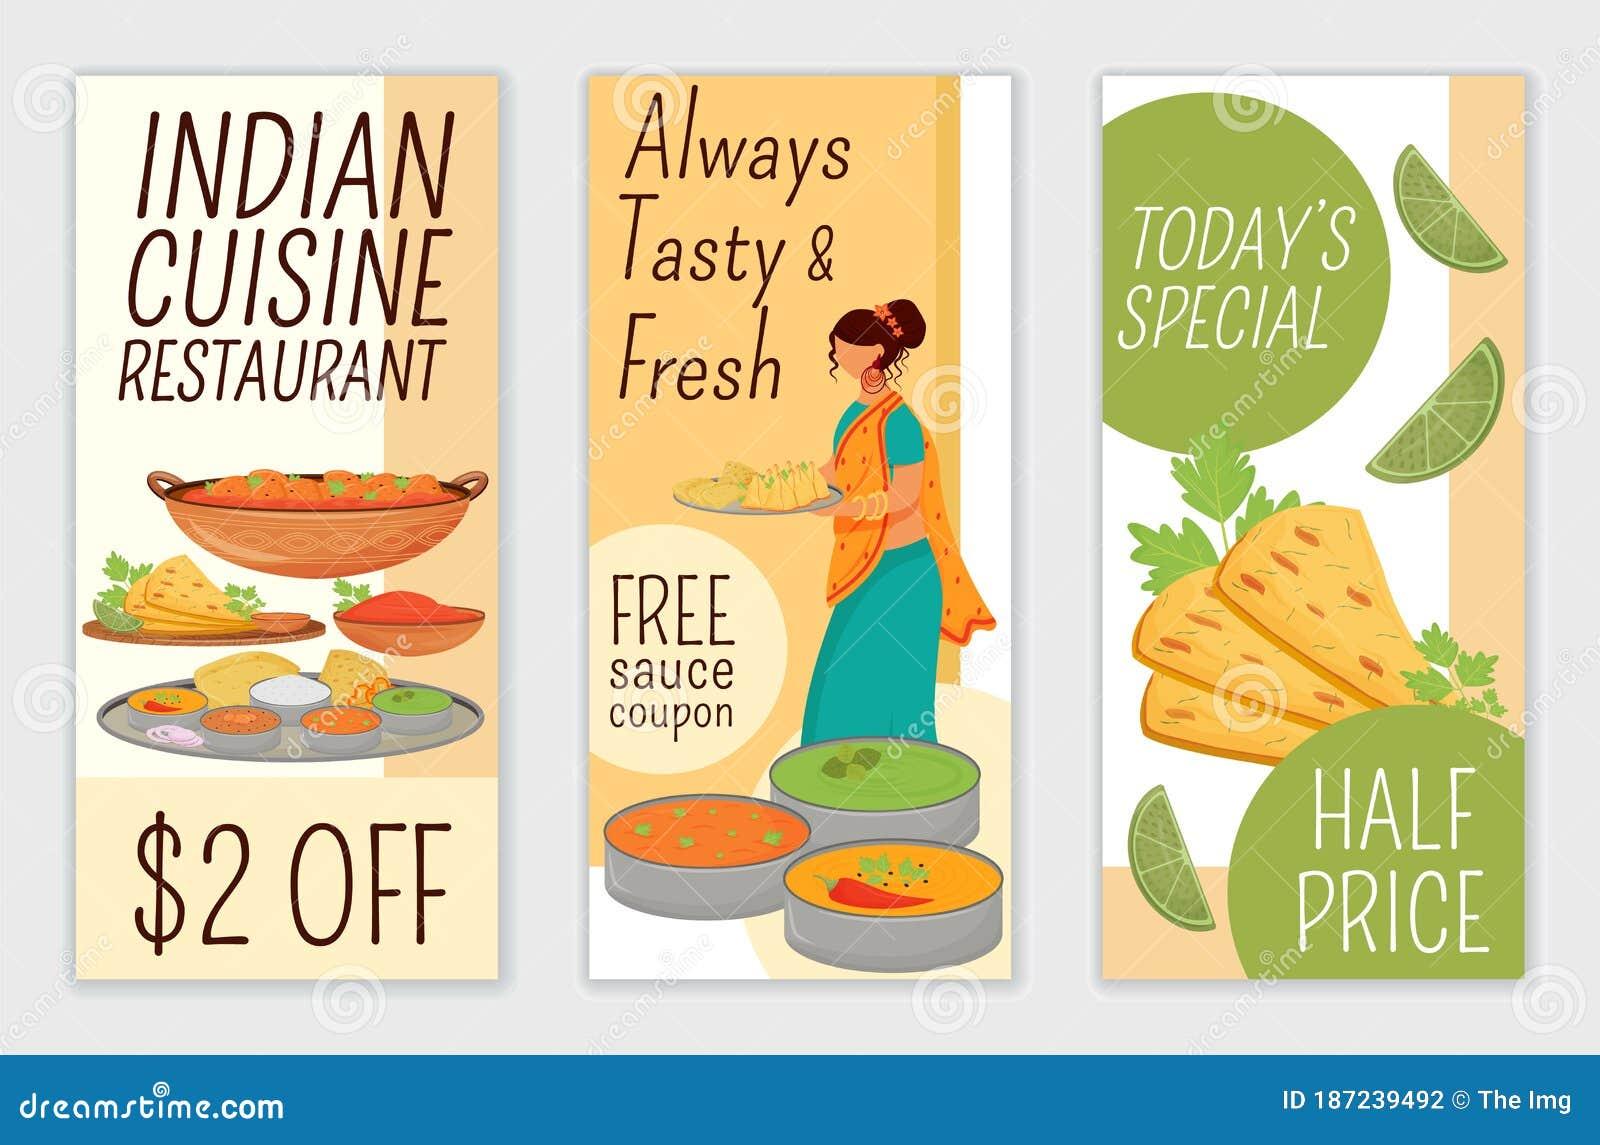 Indian Restaurant Stock Illustrations 3 600 Indian Restaurant Stock Illustrations Vectors Clipart Dreamstime